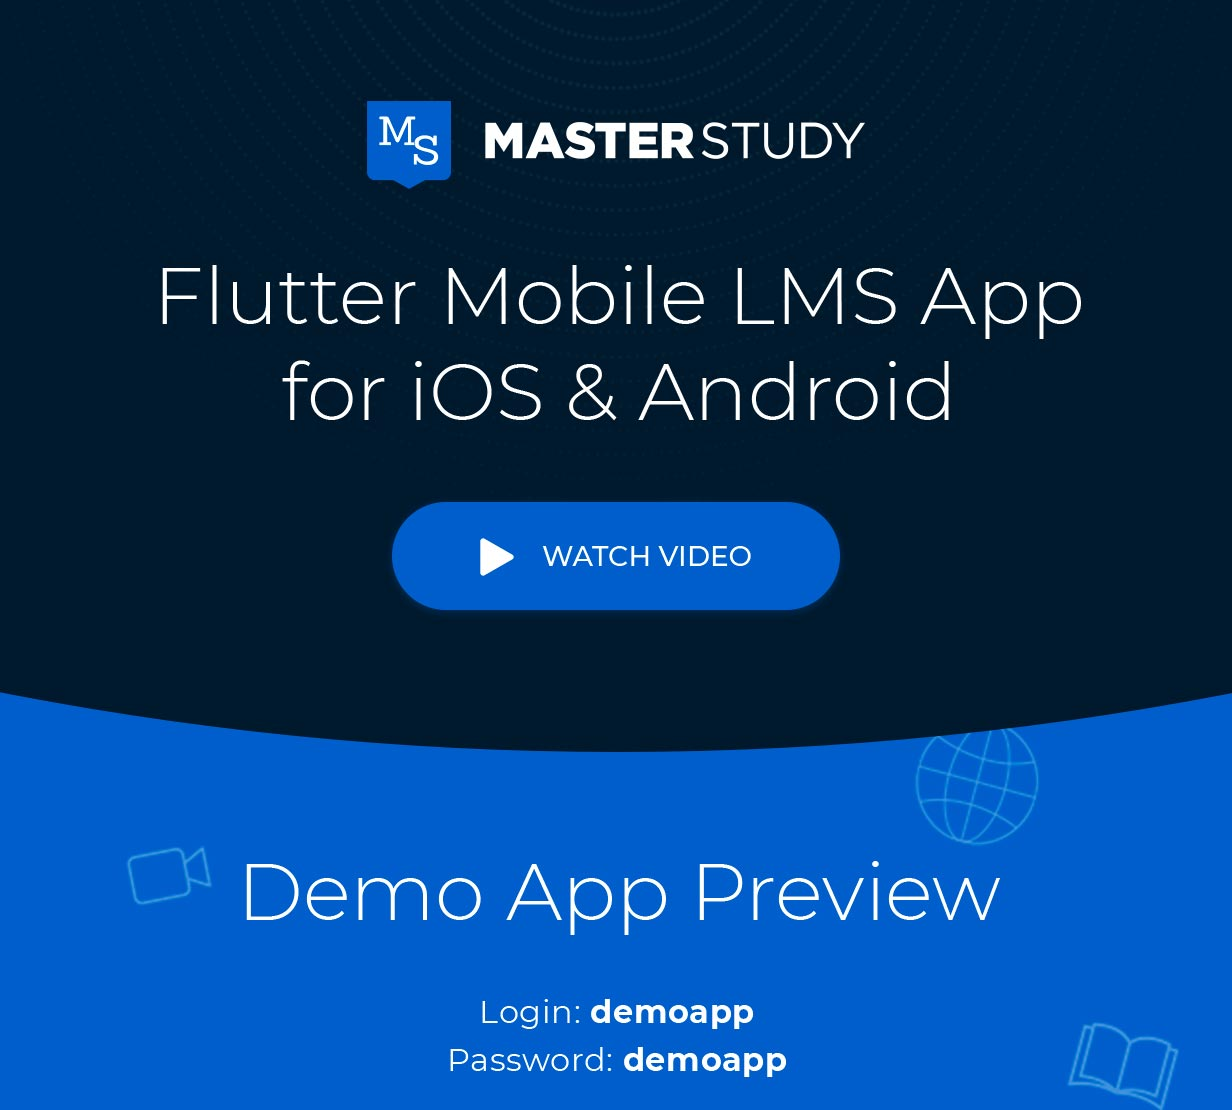 MasterStudy App - دانلود قالب وردپرس Masterstudy - پوسته تحصیلات و آموزشی وردپرس